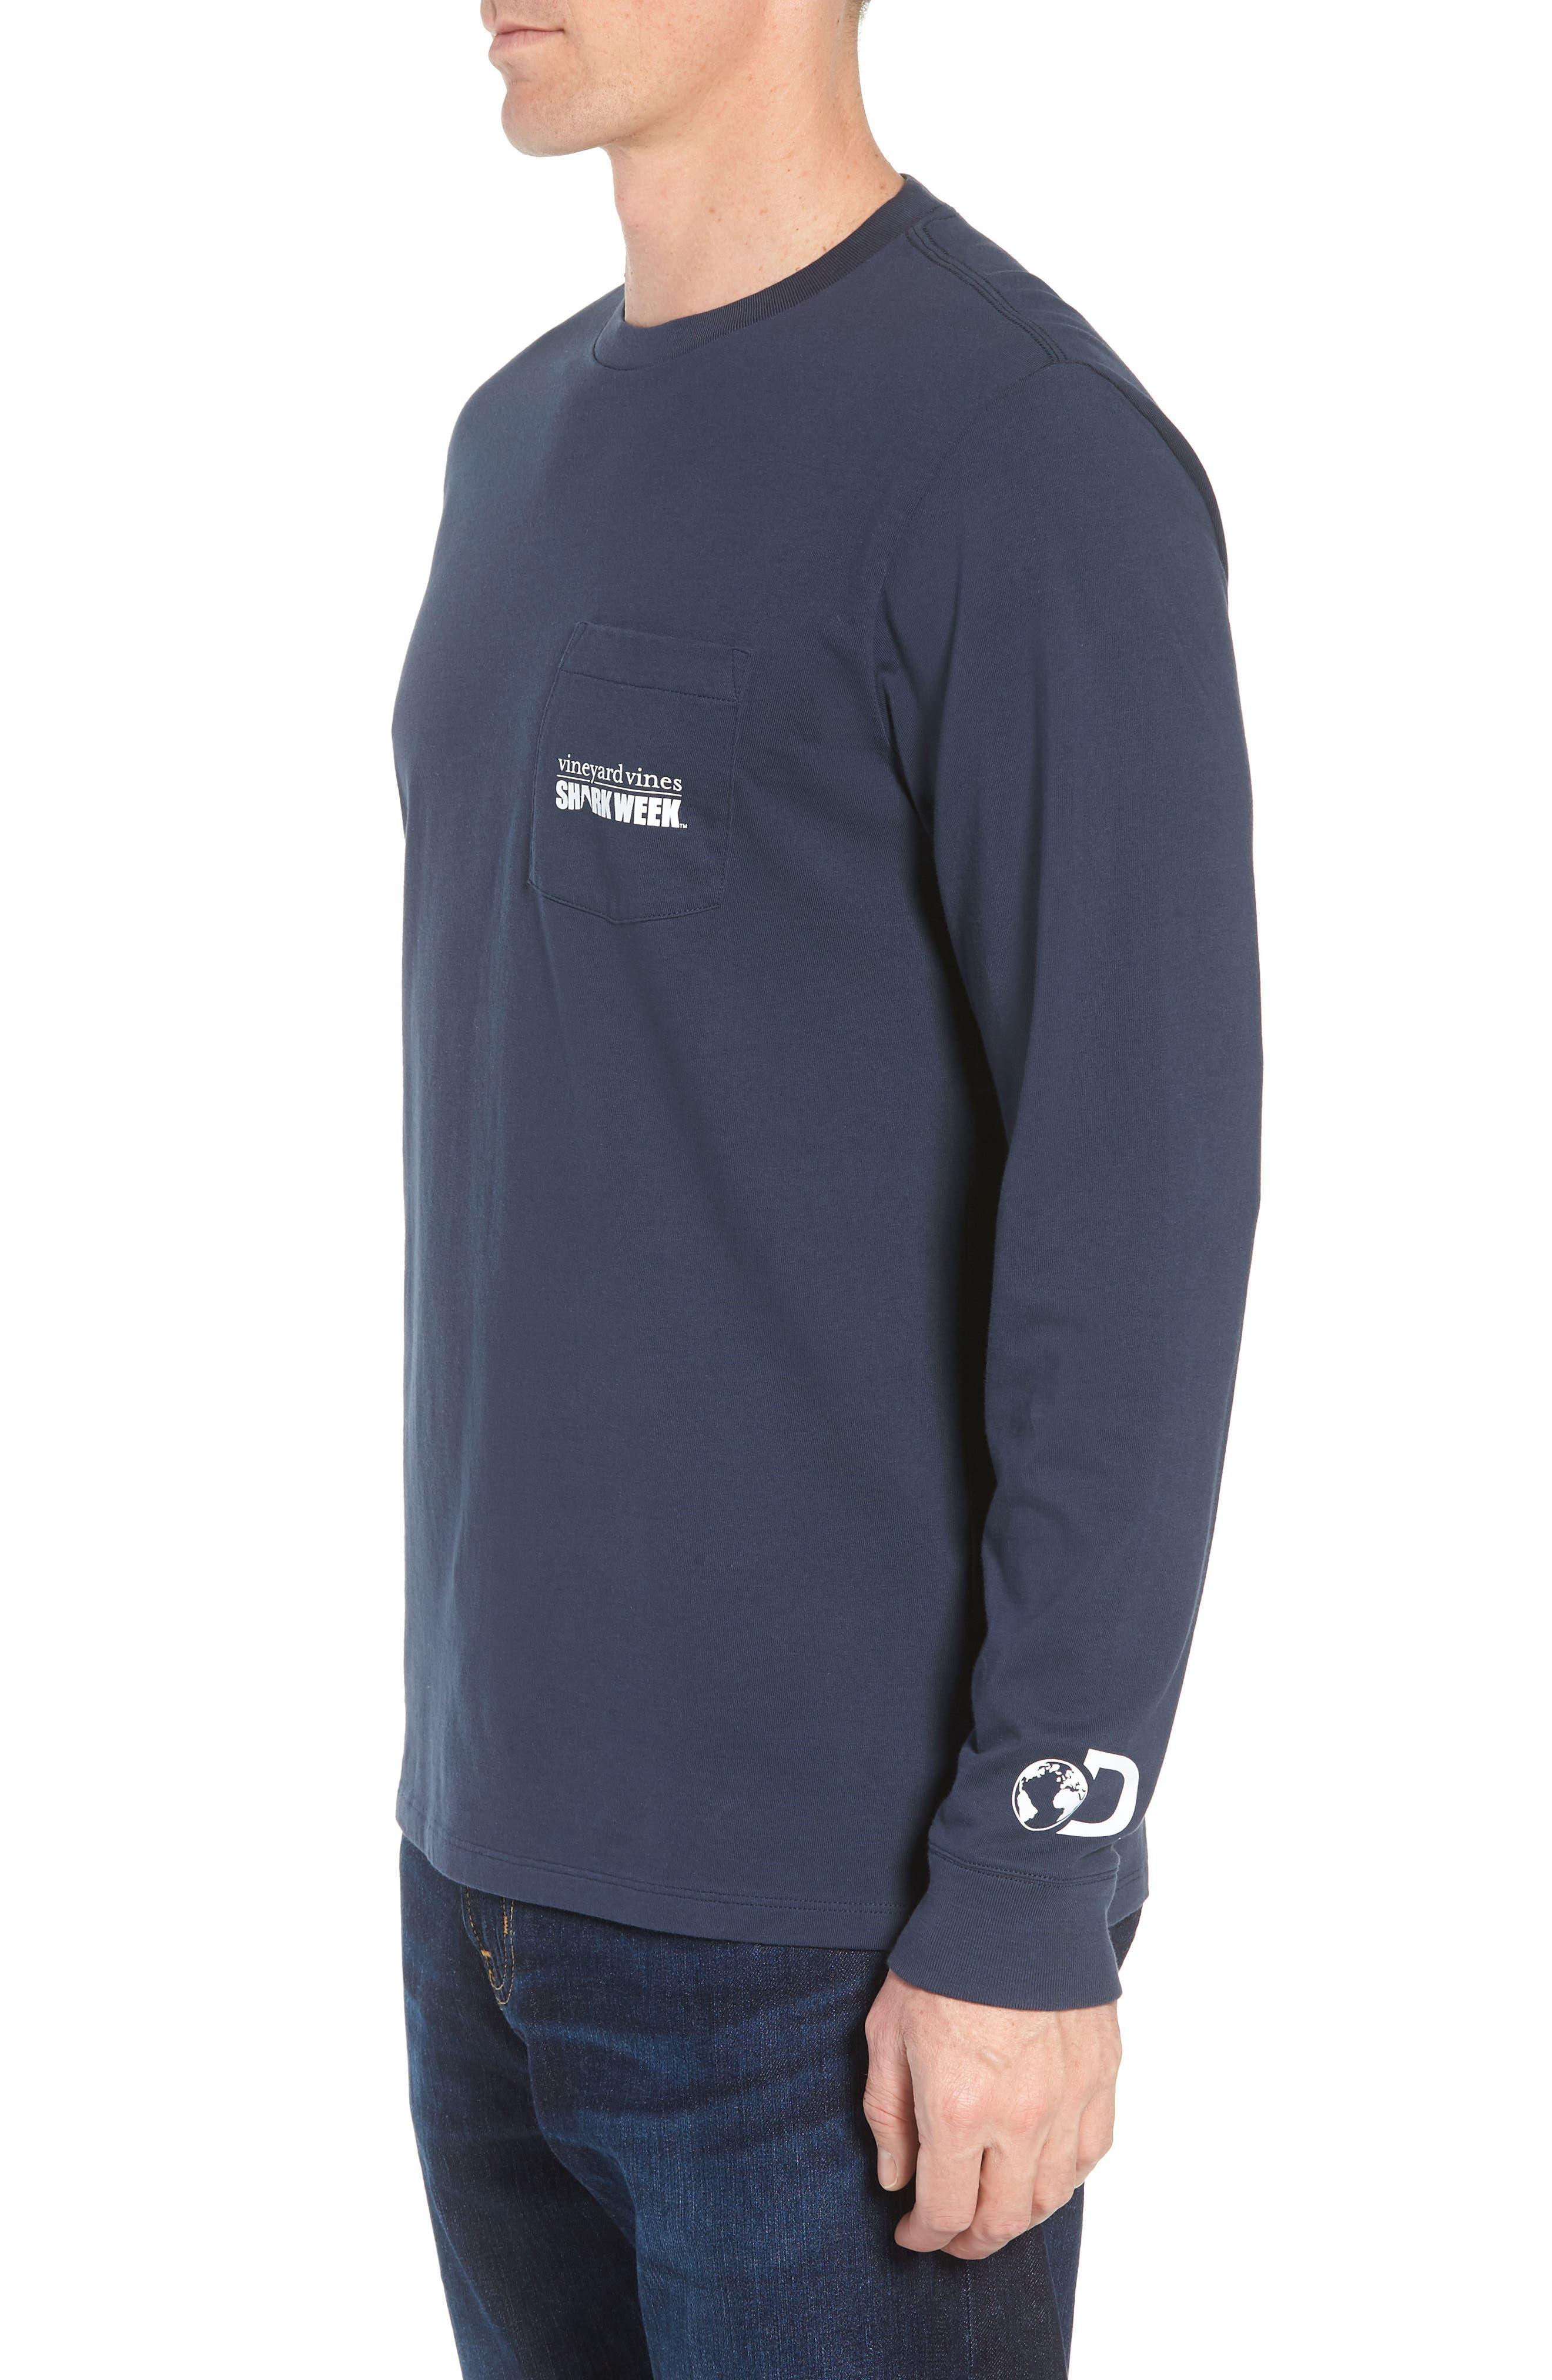 x Shark Week<sup>™</sup> Logo Long Sleeve Pocket T-Shirt,                             Alternate thumbnail 3, color,                             406